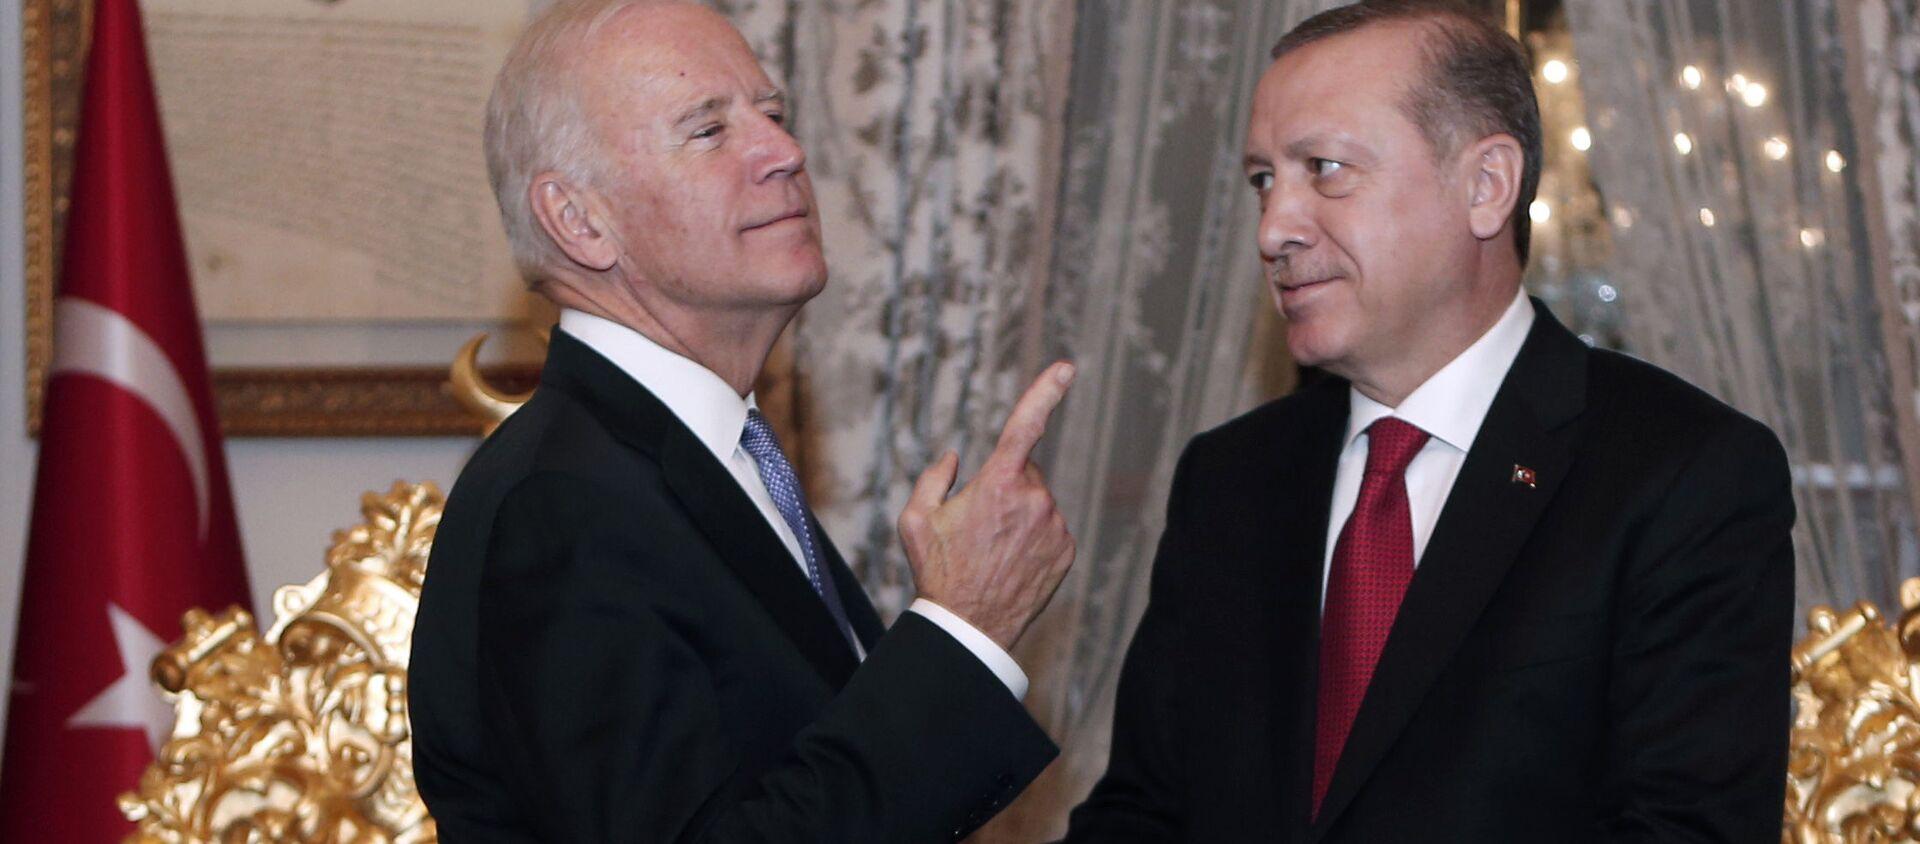 Joe Biden trong cuộc gặp với Recep Tayyip Erdogan ở Istanbul - Sputnik Việt Nam, 1920, 30.04.2021